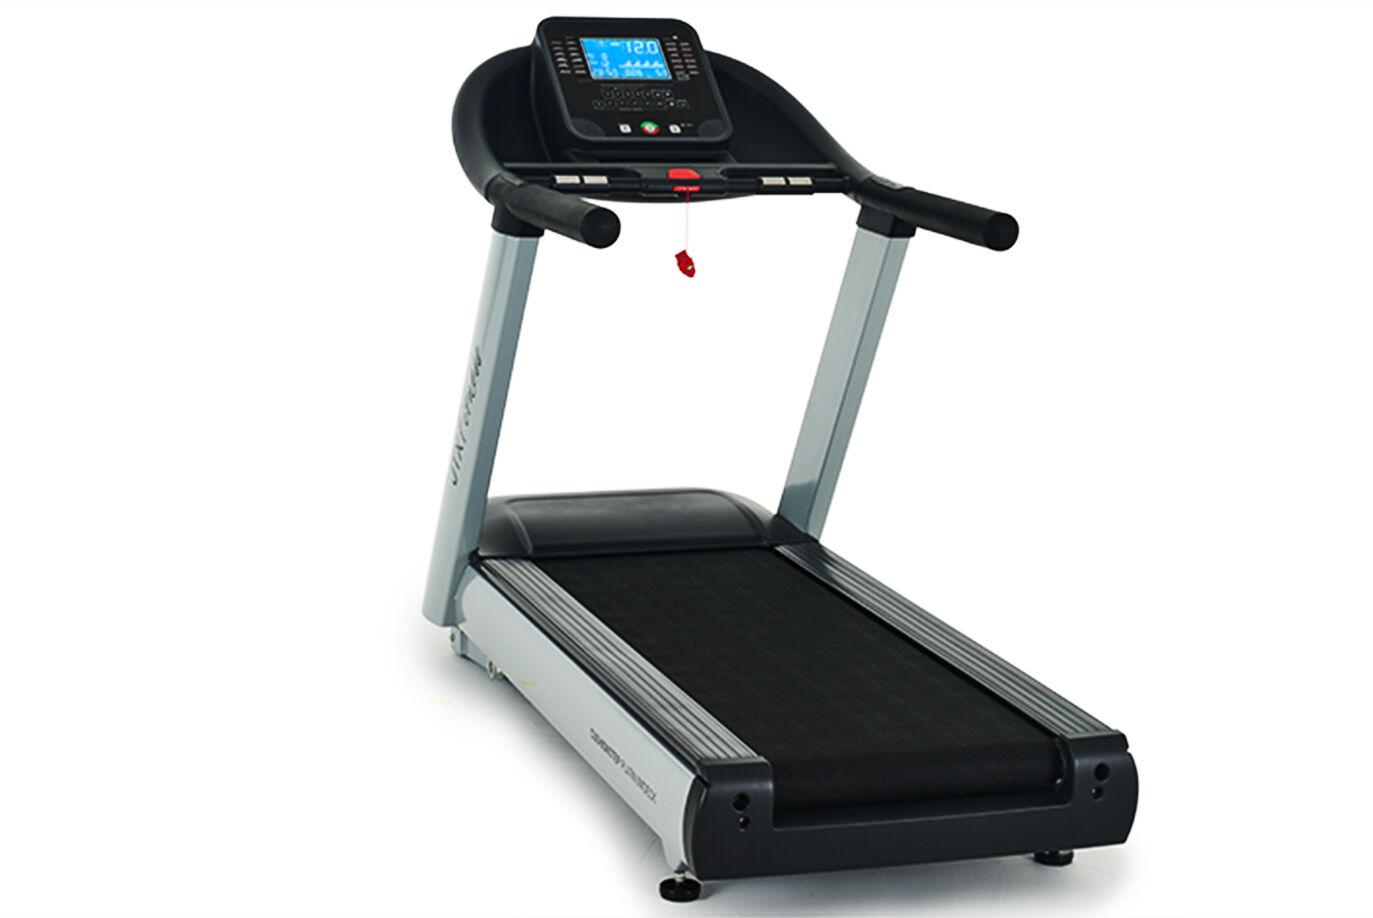 JTX Gym Treadmill - Club-Max